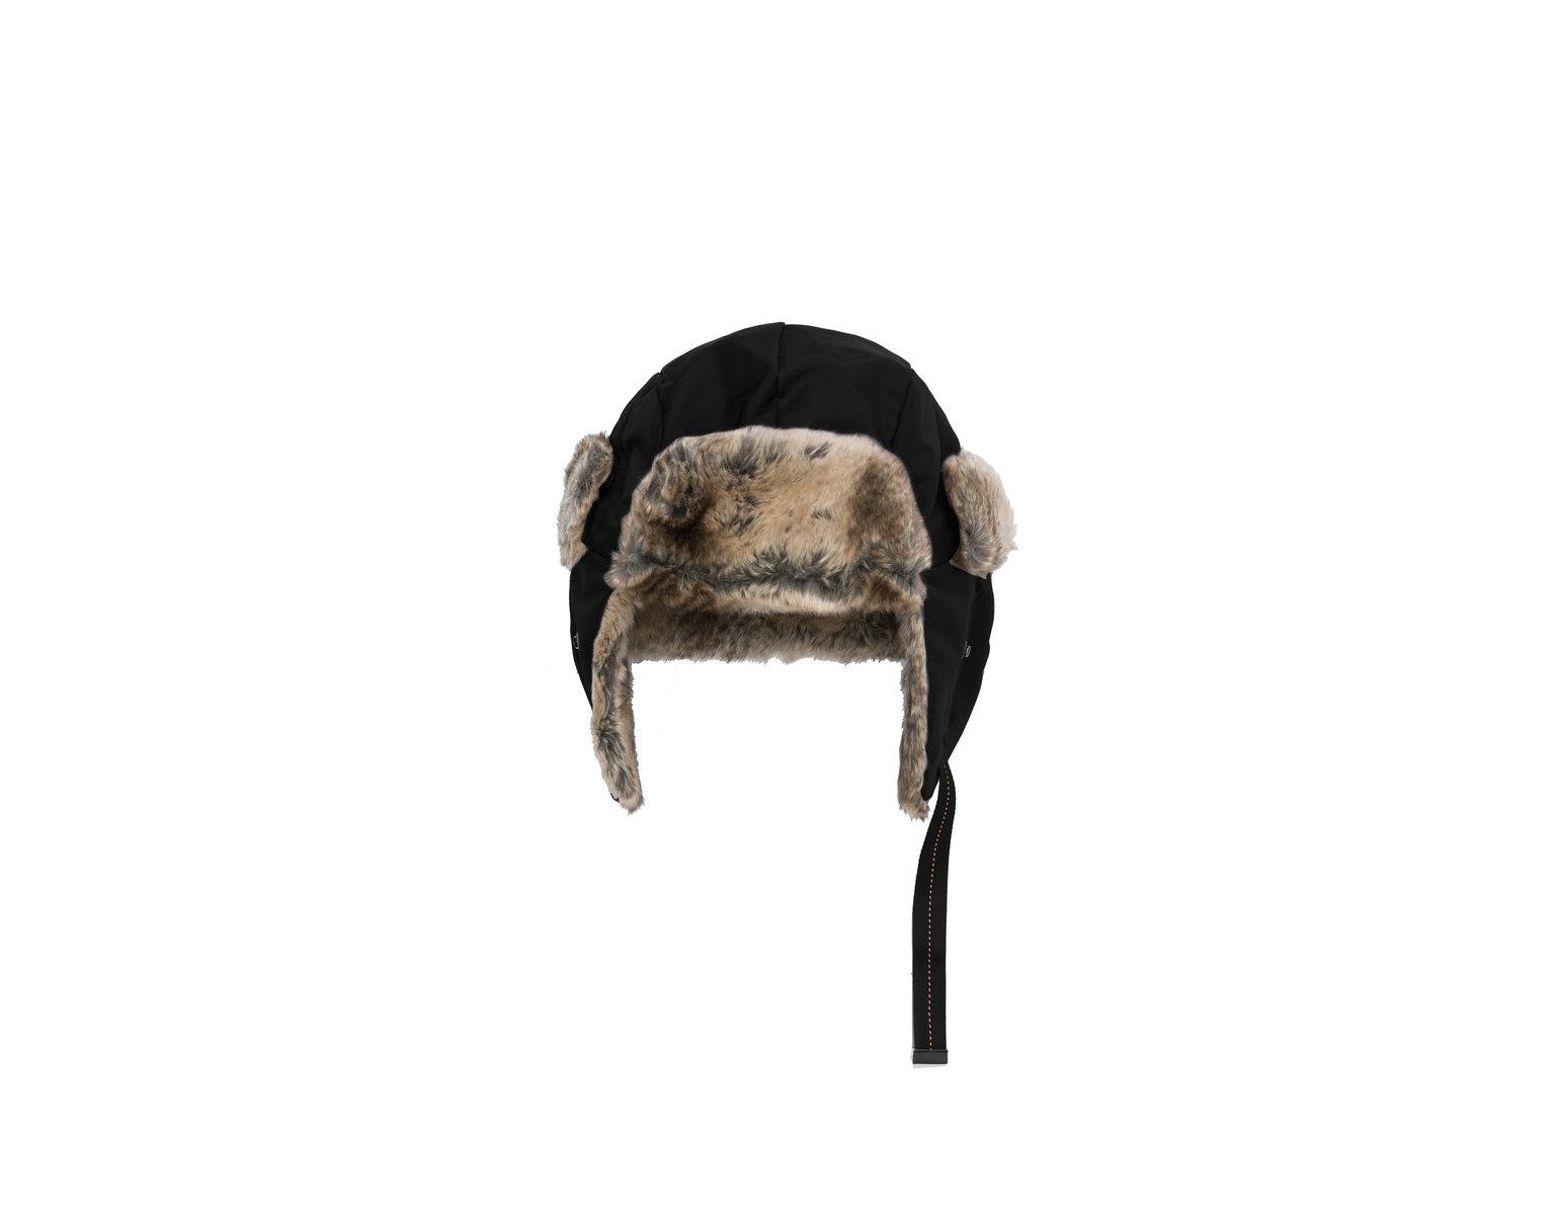 c11bca3fd4f37 Parajumpers Aviator Hat in Black for Men - Lyst